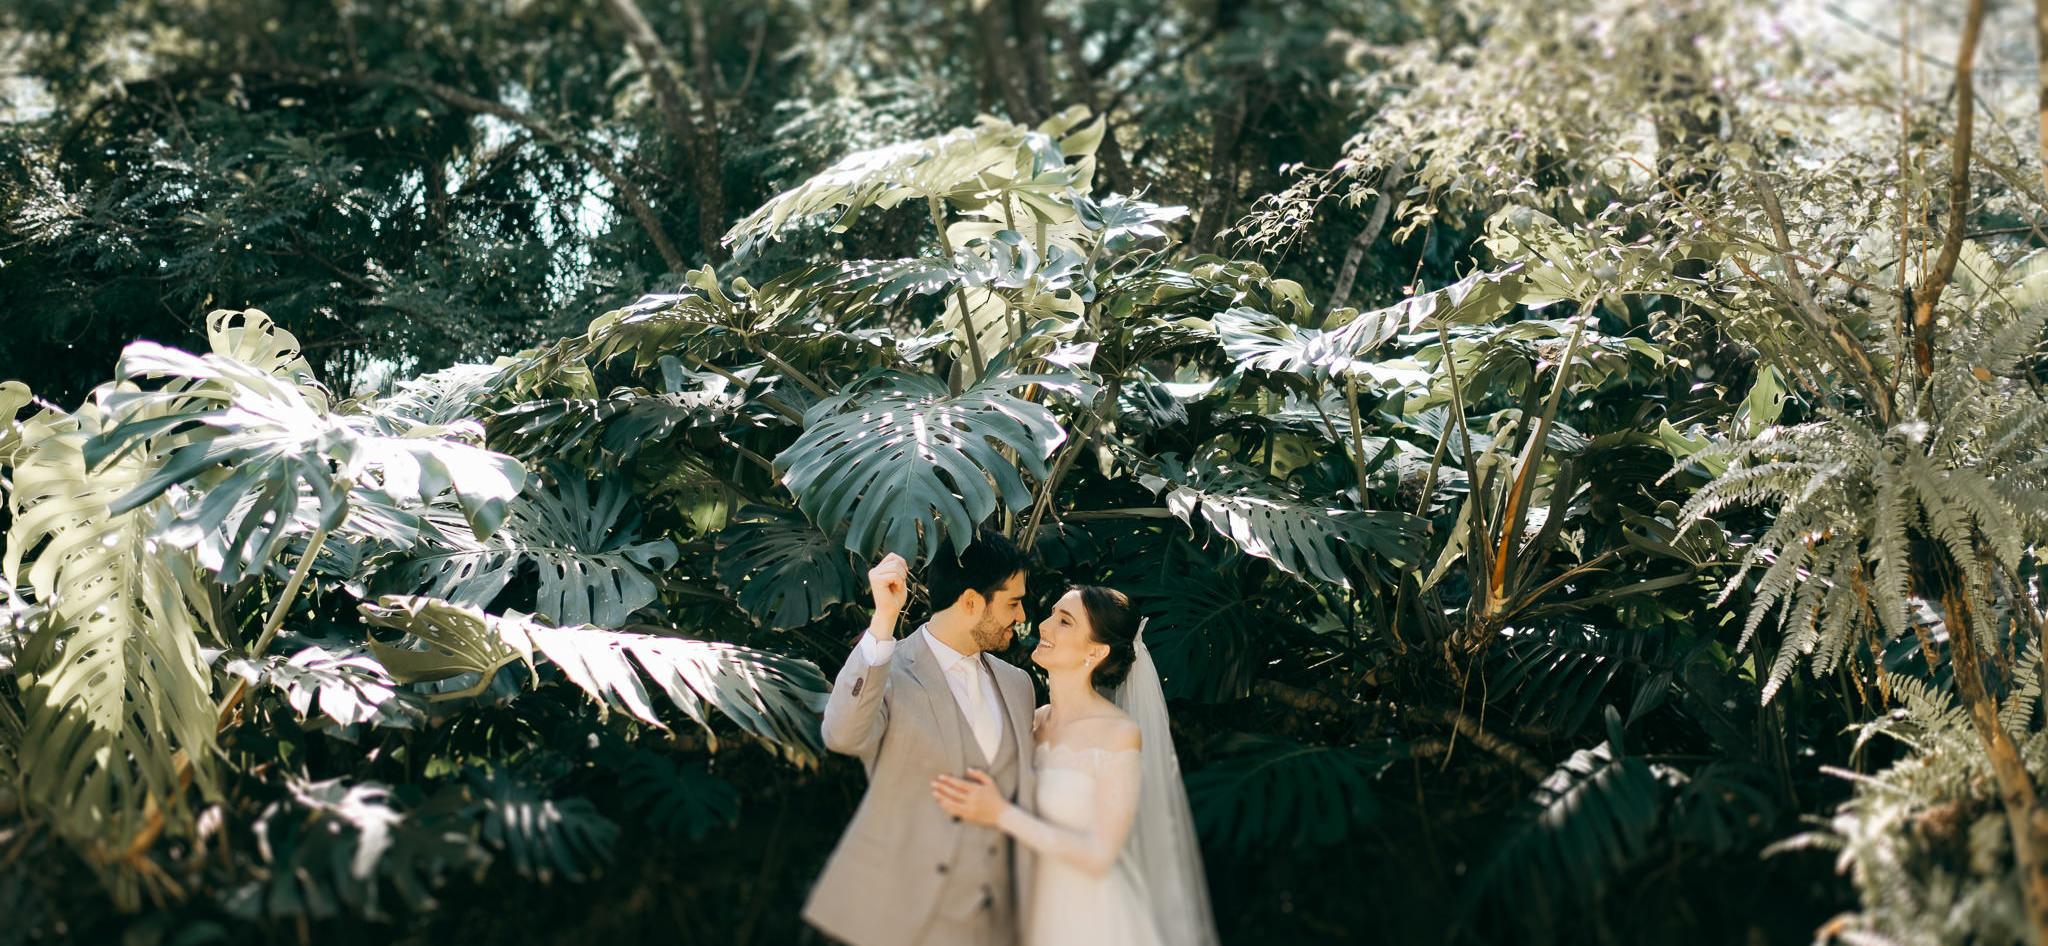 Contate ClickDois - Fotógrafos de Casamento e Família